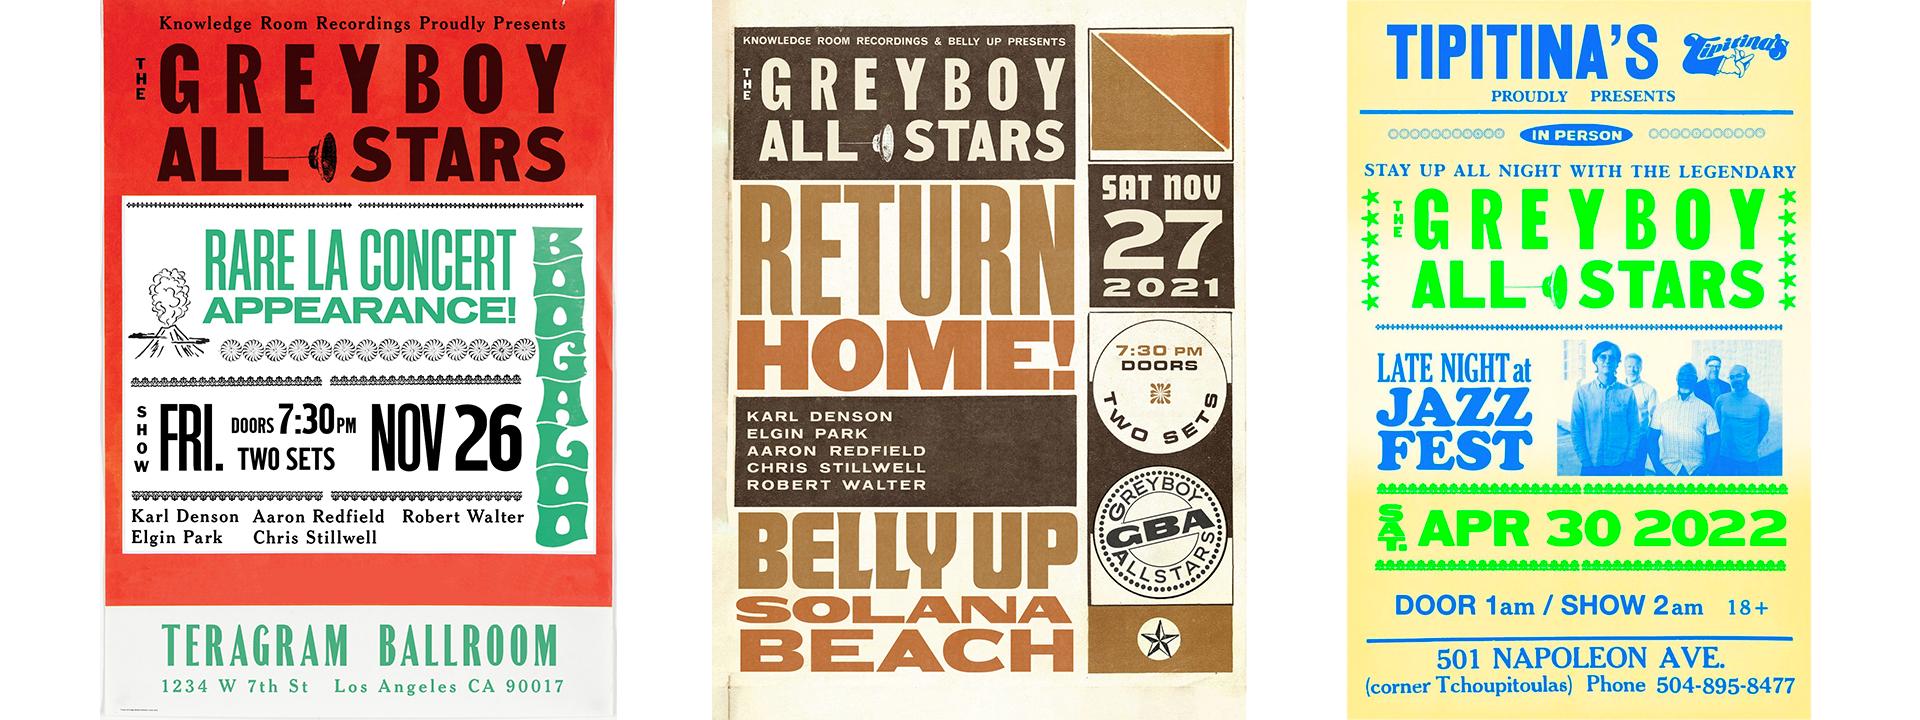 The Greyboy Allstars Tour Dates Flyer